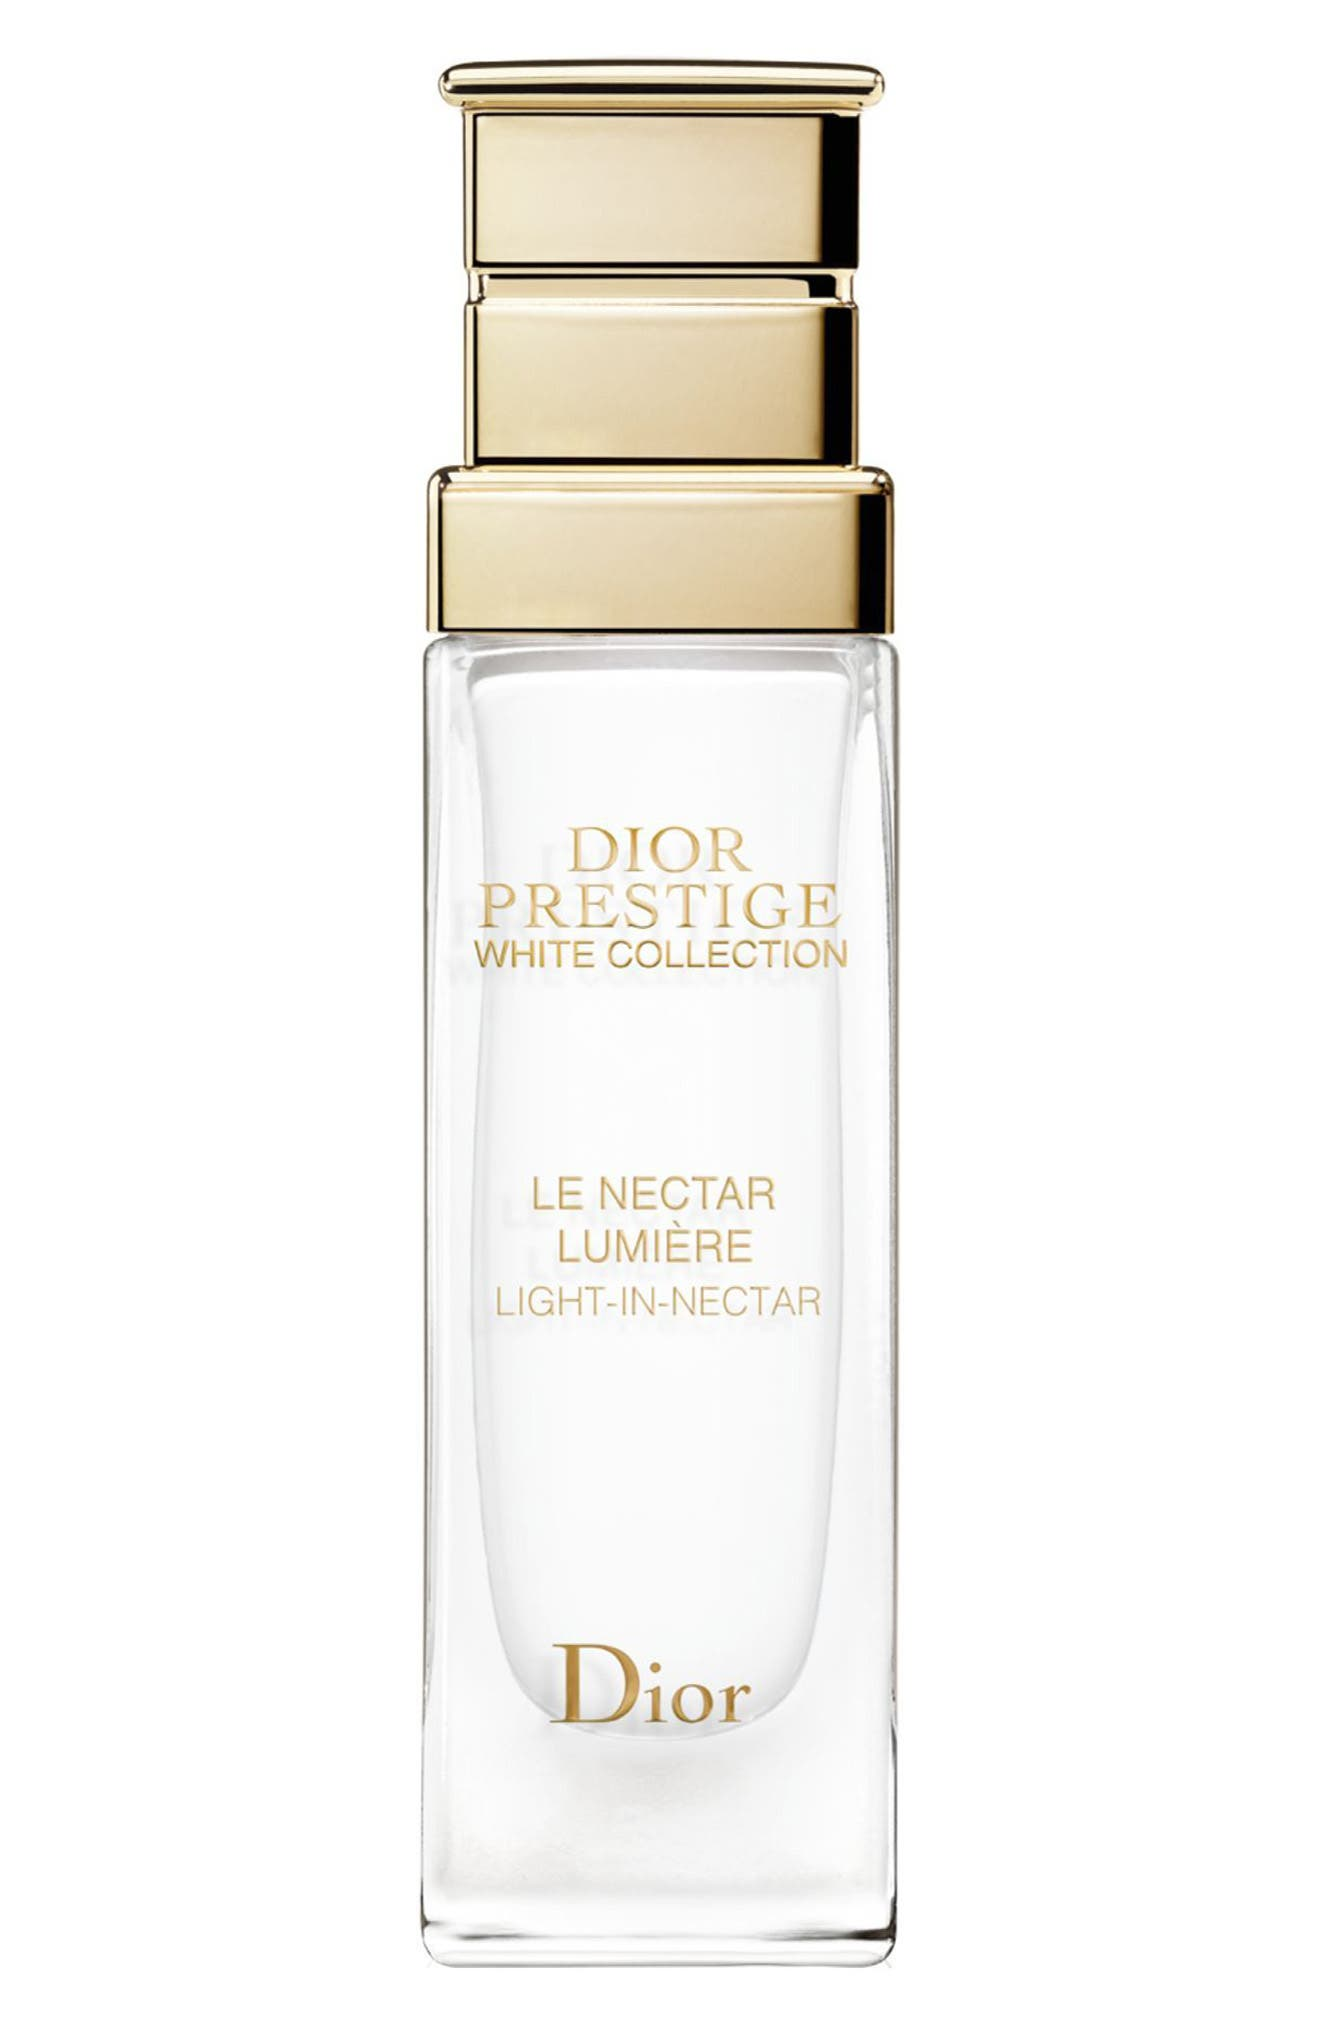 Dior Prestige White Le Nectar Lumière Light-in-Nectar